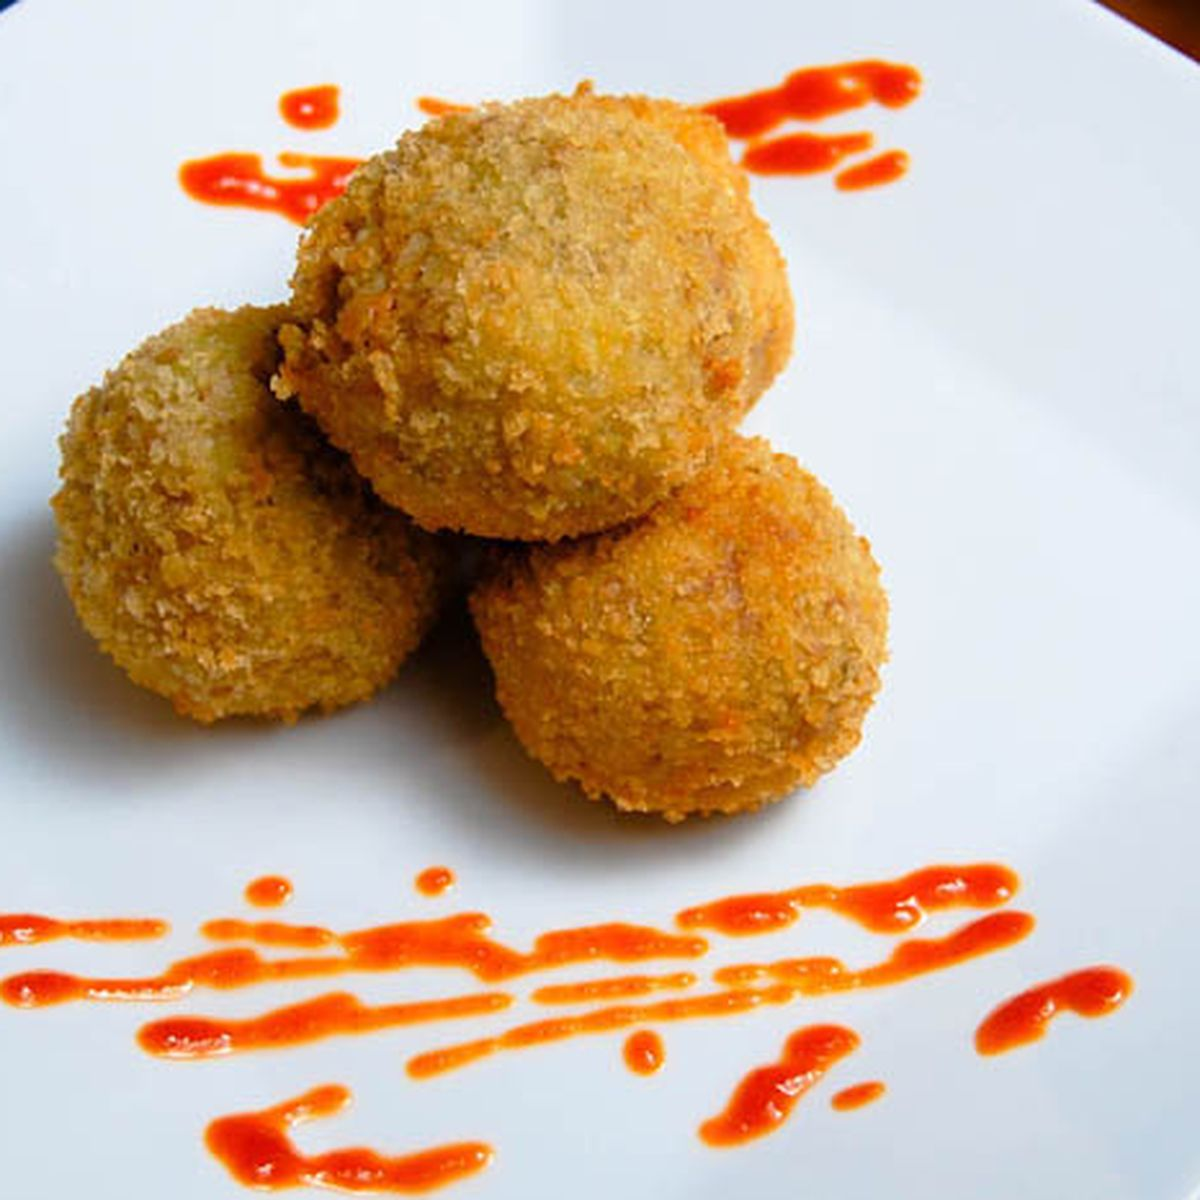 Deep Fried Pork & Potato Balls